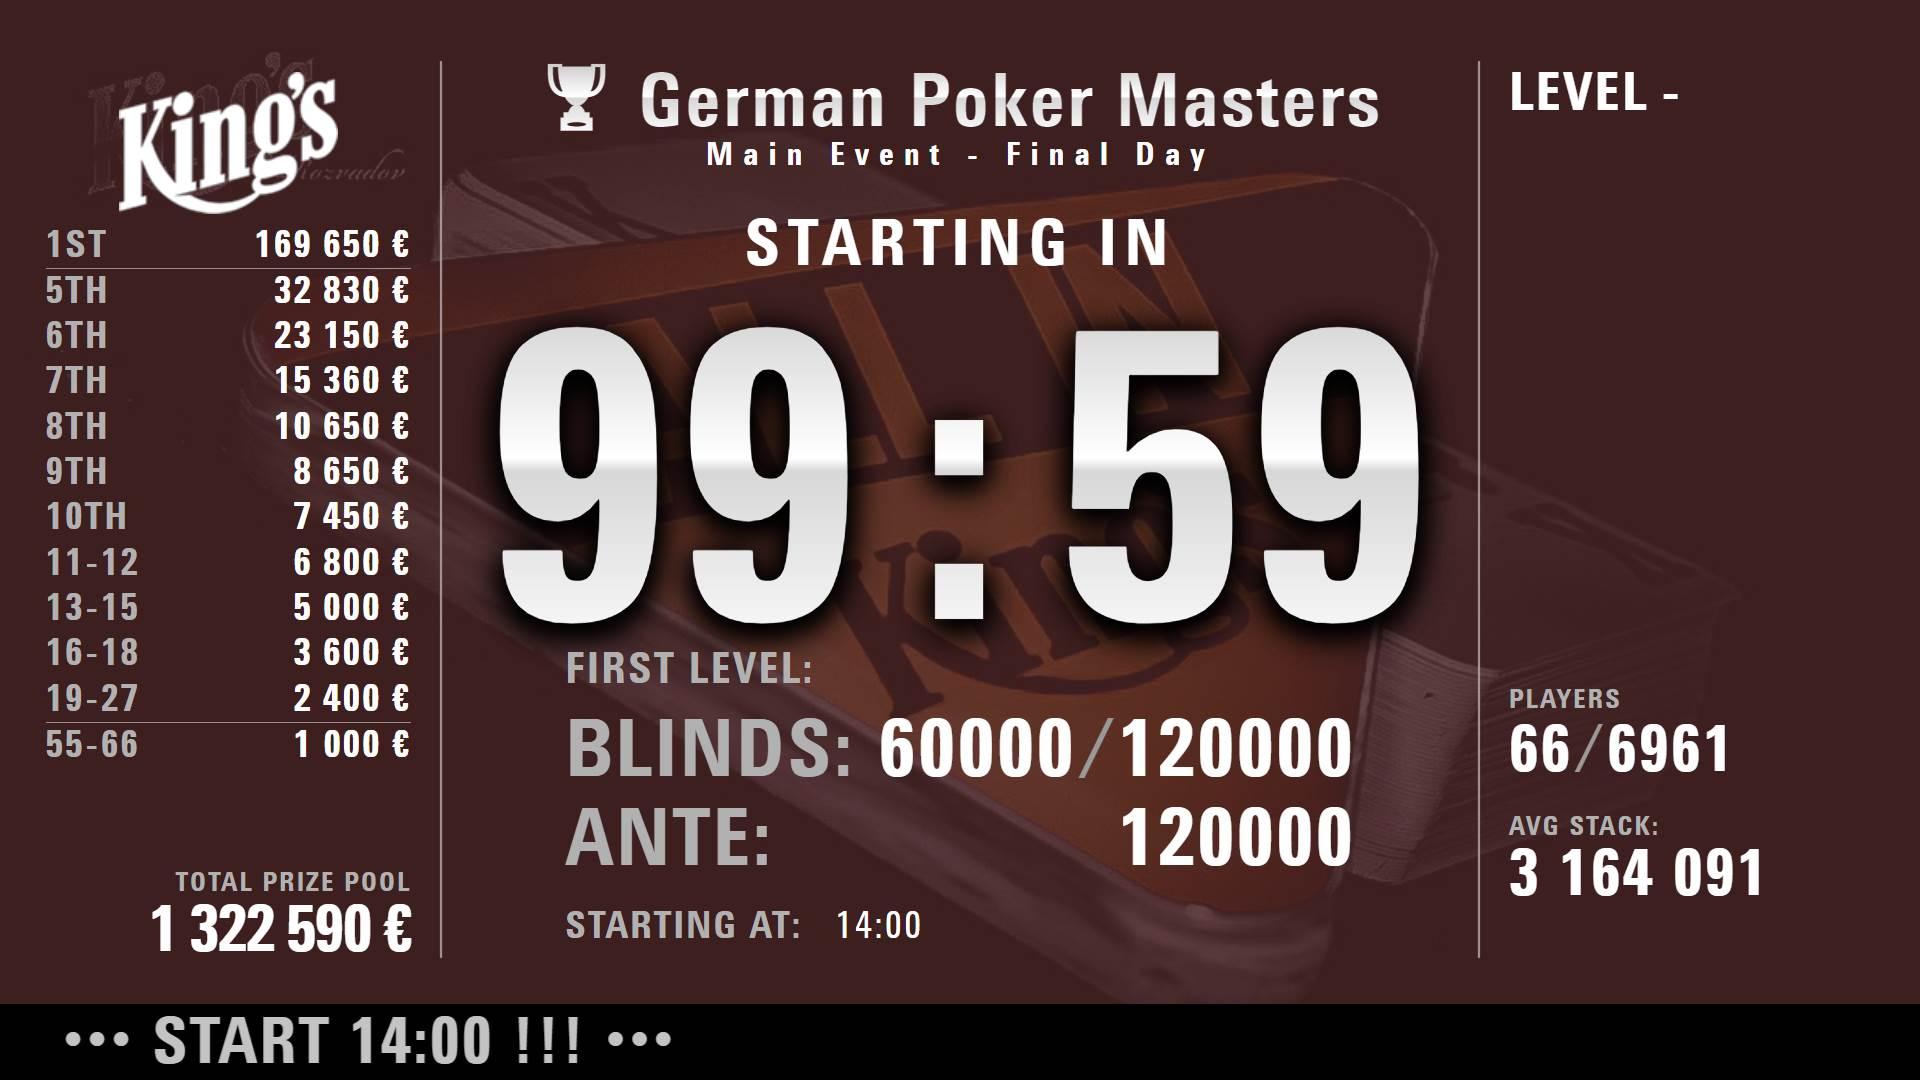 NR. 1 Casino - 380679